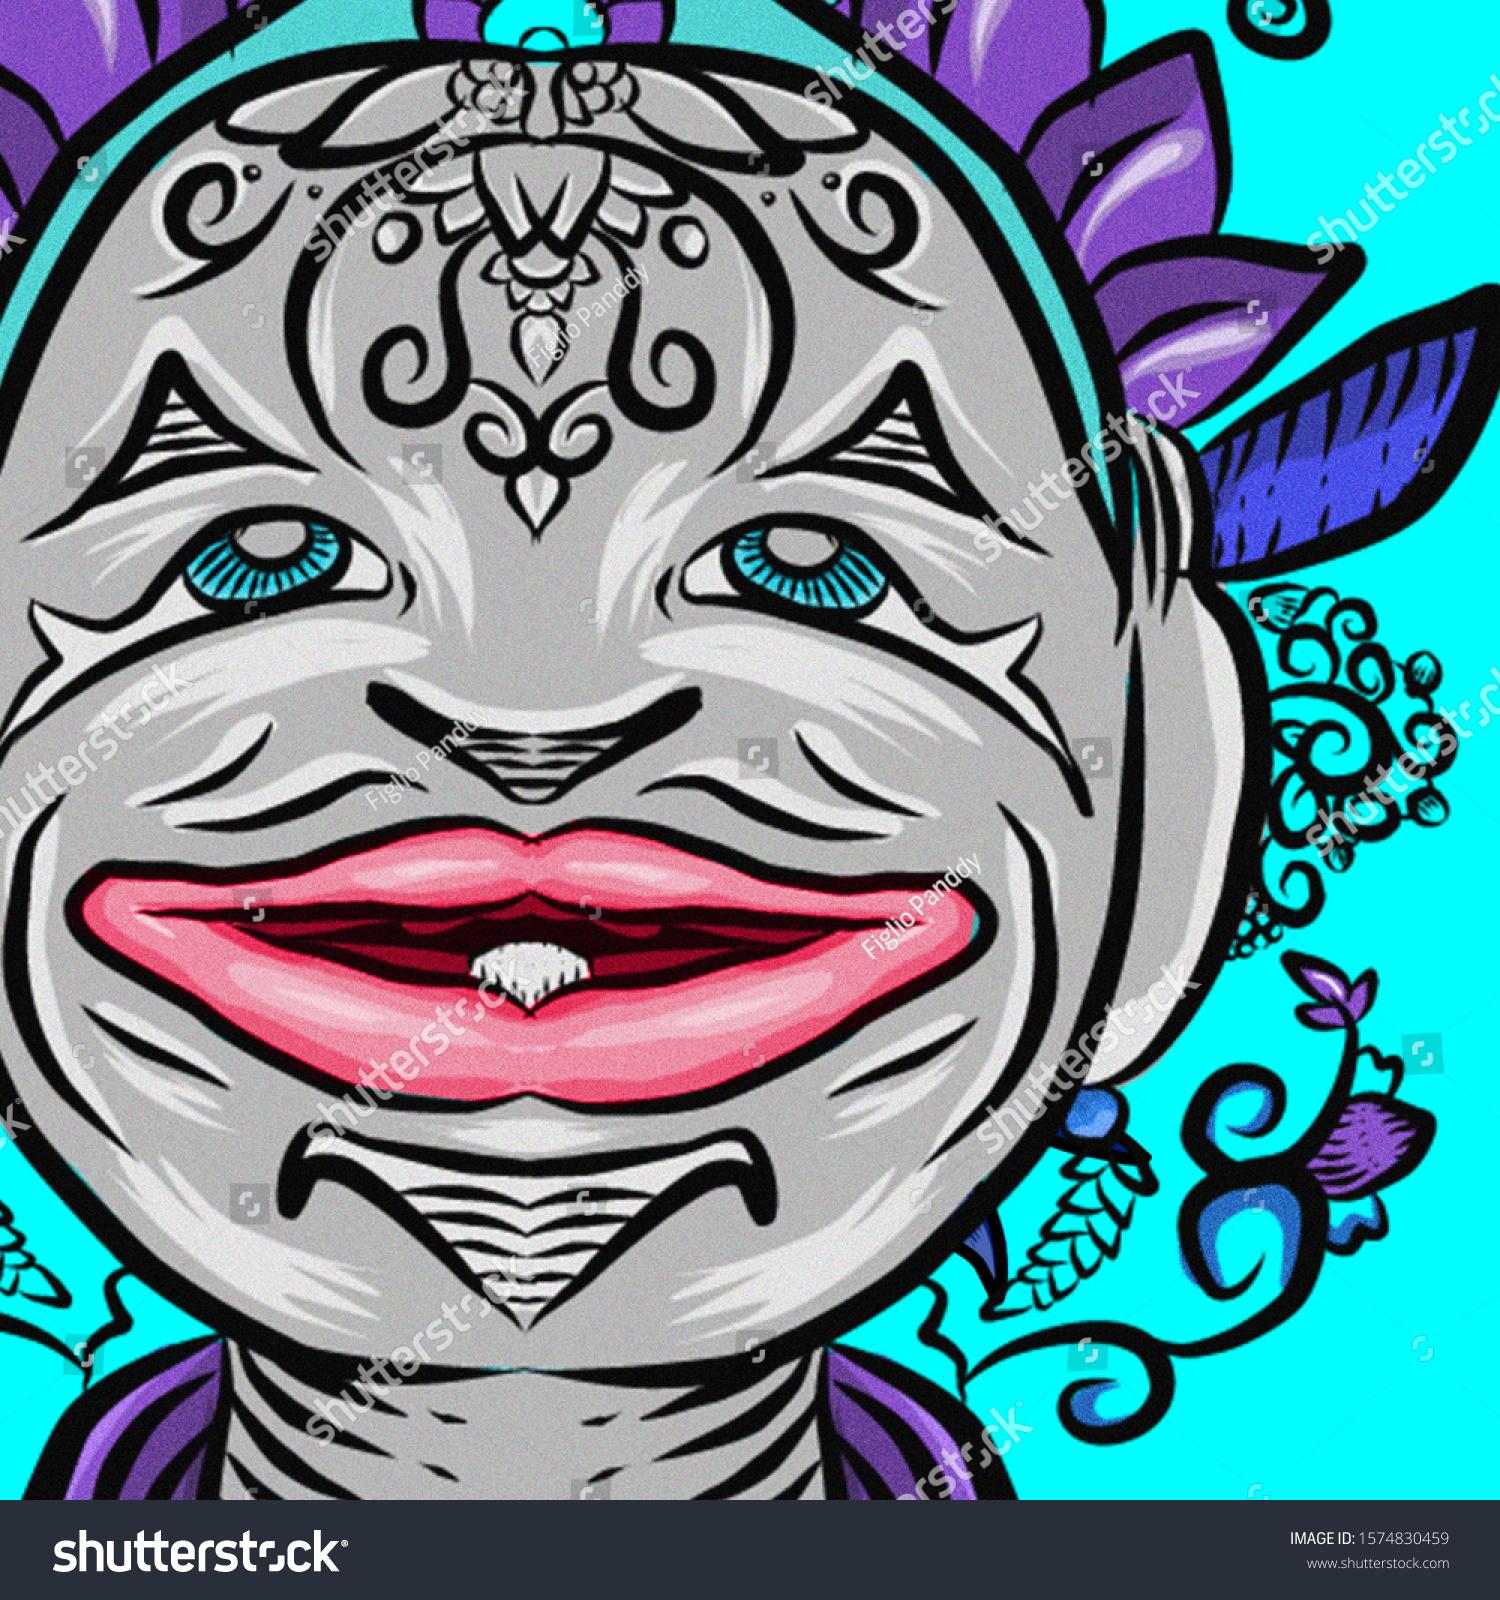 characteristics wayang golek semar native west stock illustration 1574830459 https www shutterstock com image illustration characteristics wayang golek semar native west 1574830459